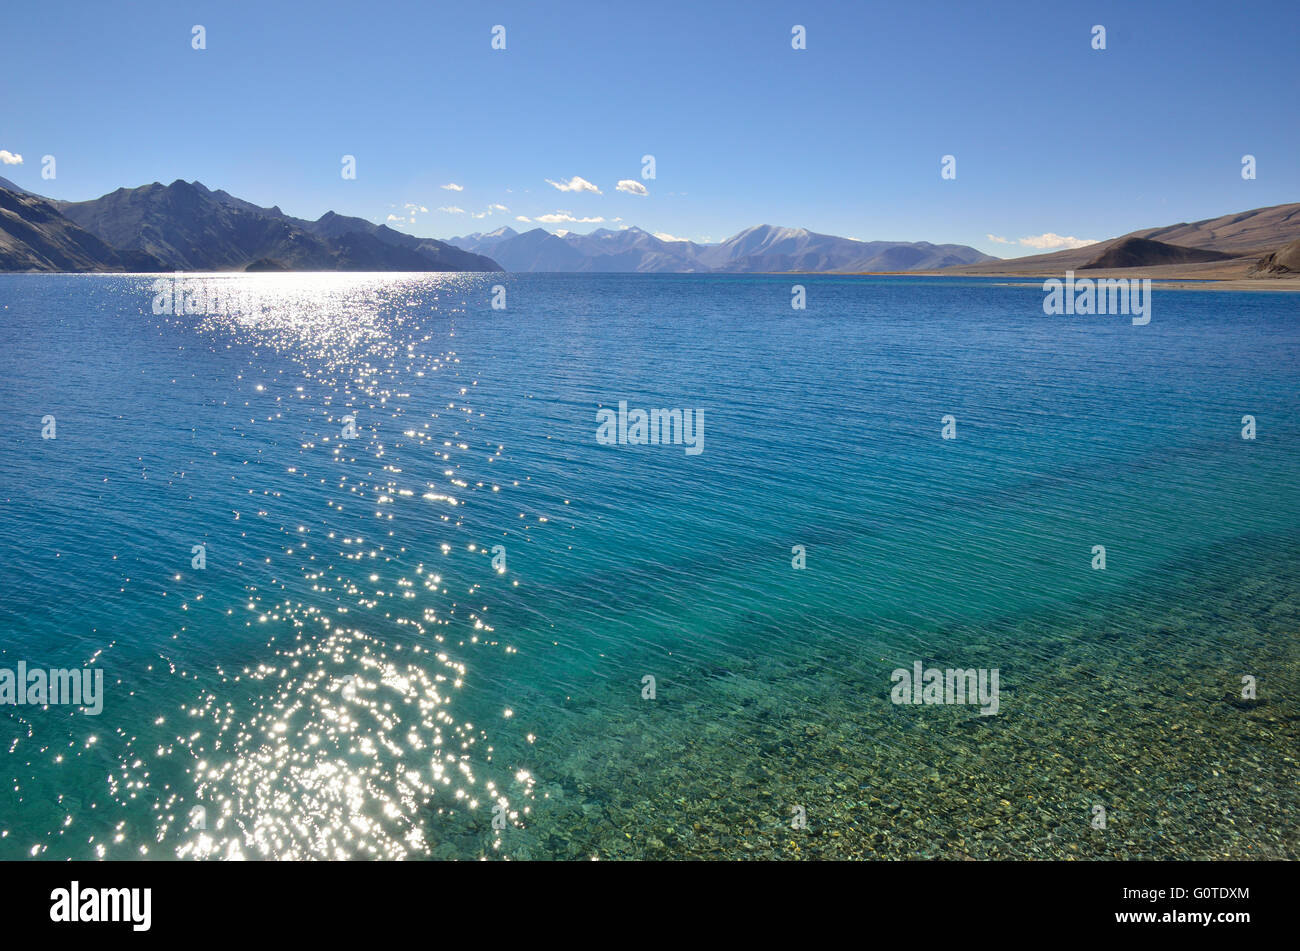 Pangong Tso, a high altitude lake at 14,270 feet, in Ladakh, Jammu and Kashmir, India Stock Photo